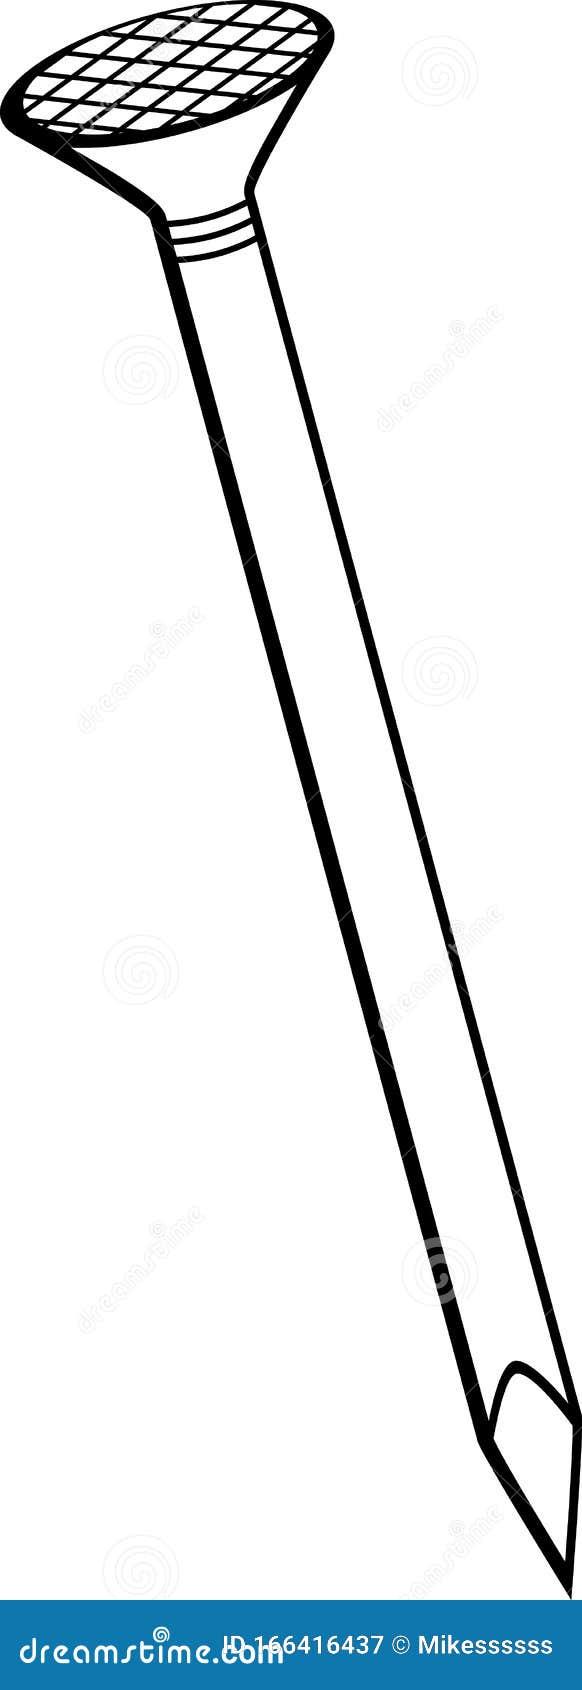 art clip head nail stock illustrations 166 art clip head nail stock illustrations vectors clipart dreamstime https www dreamstime com illustration nail fastener black white nail fastener illustration black white image166416437